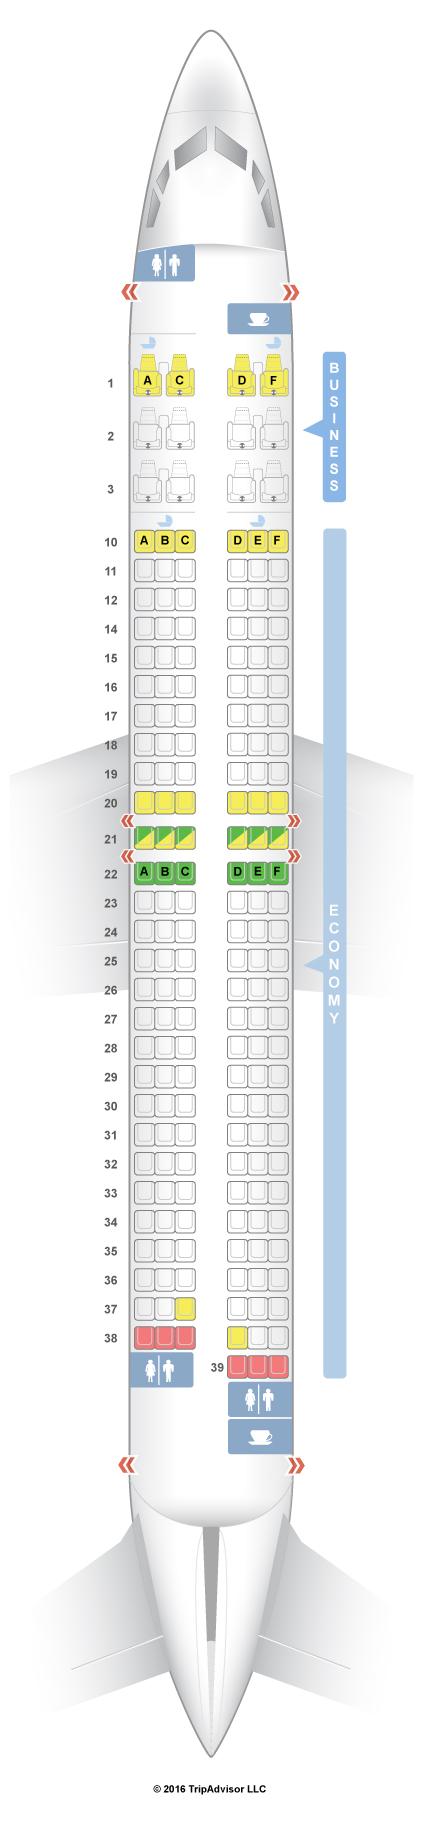 Seatguru Seat Map Oman Air Seatguru